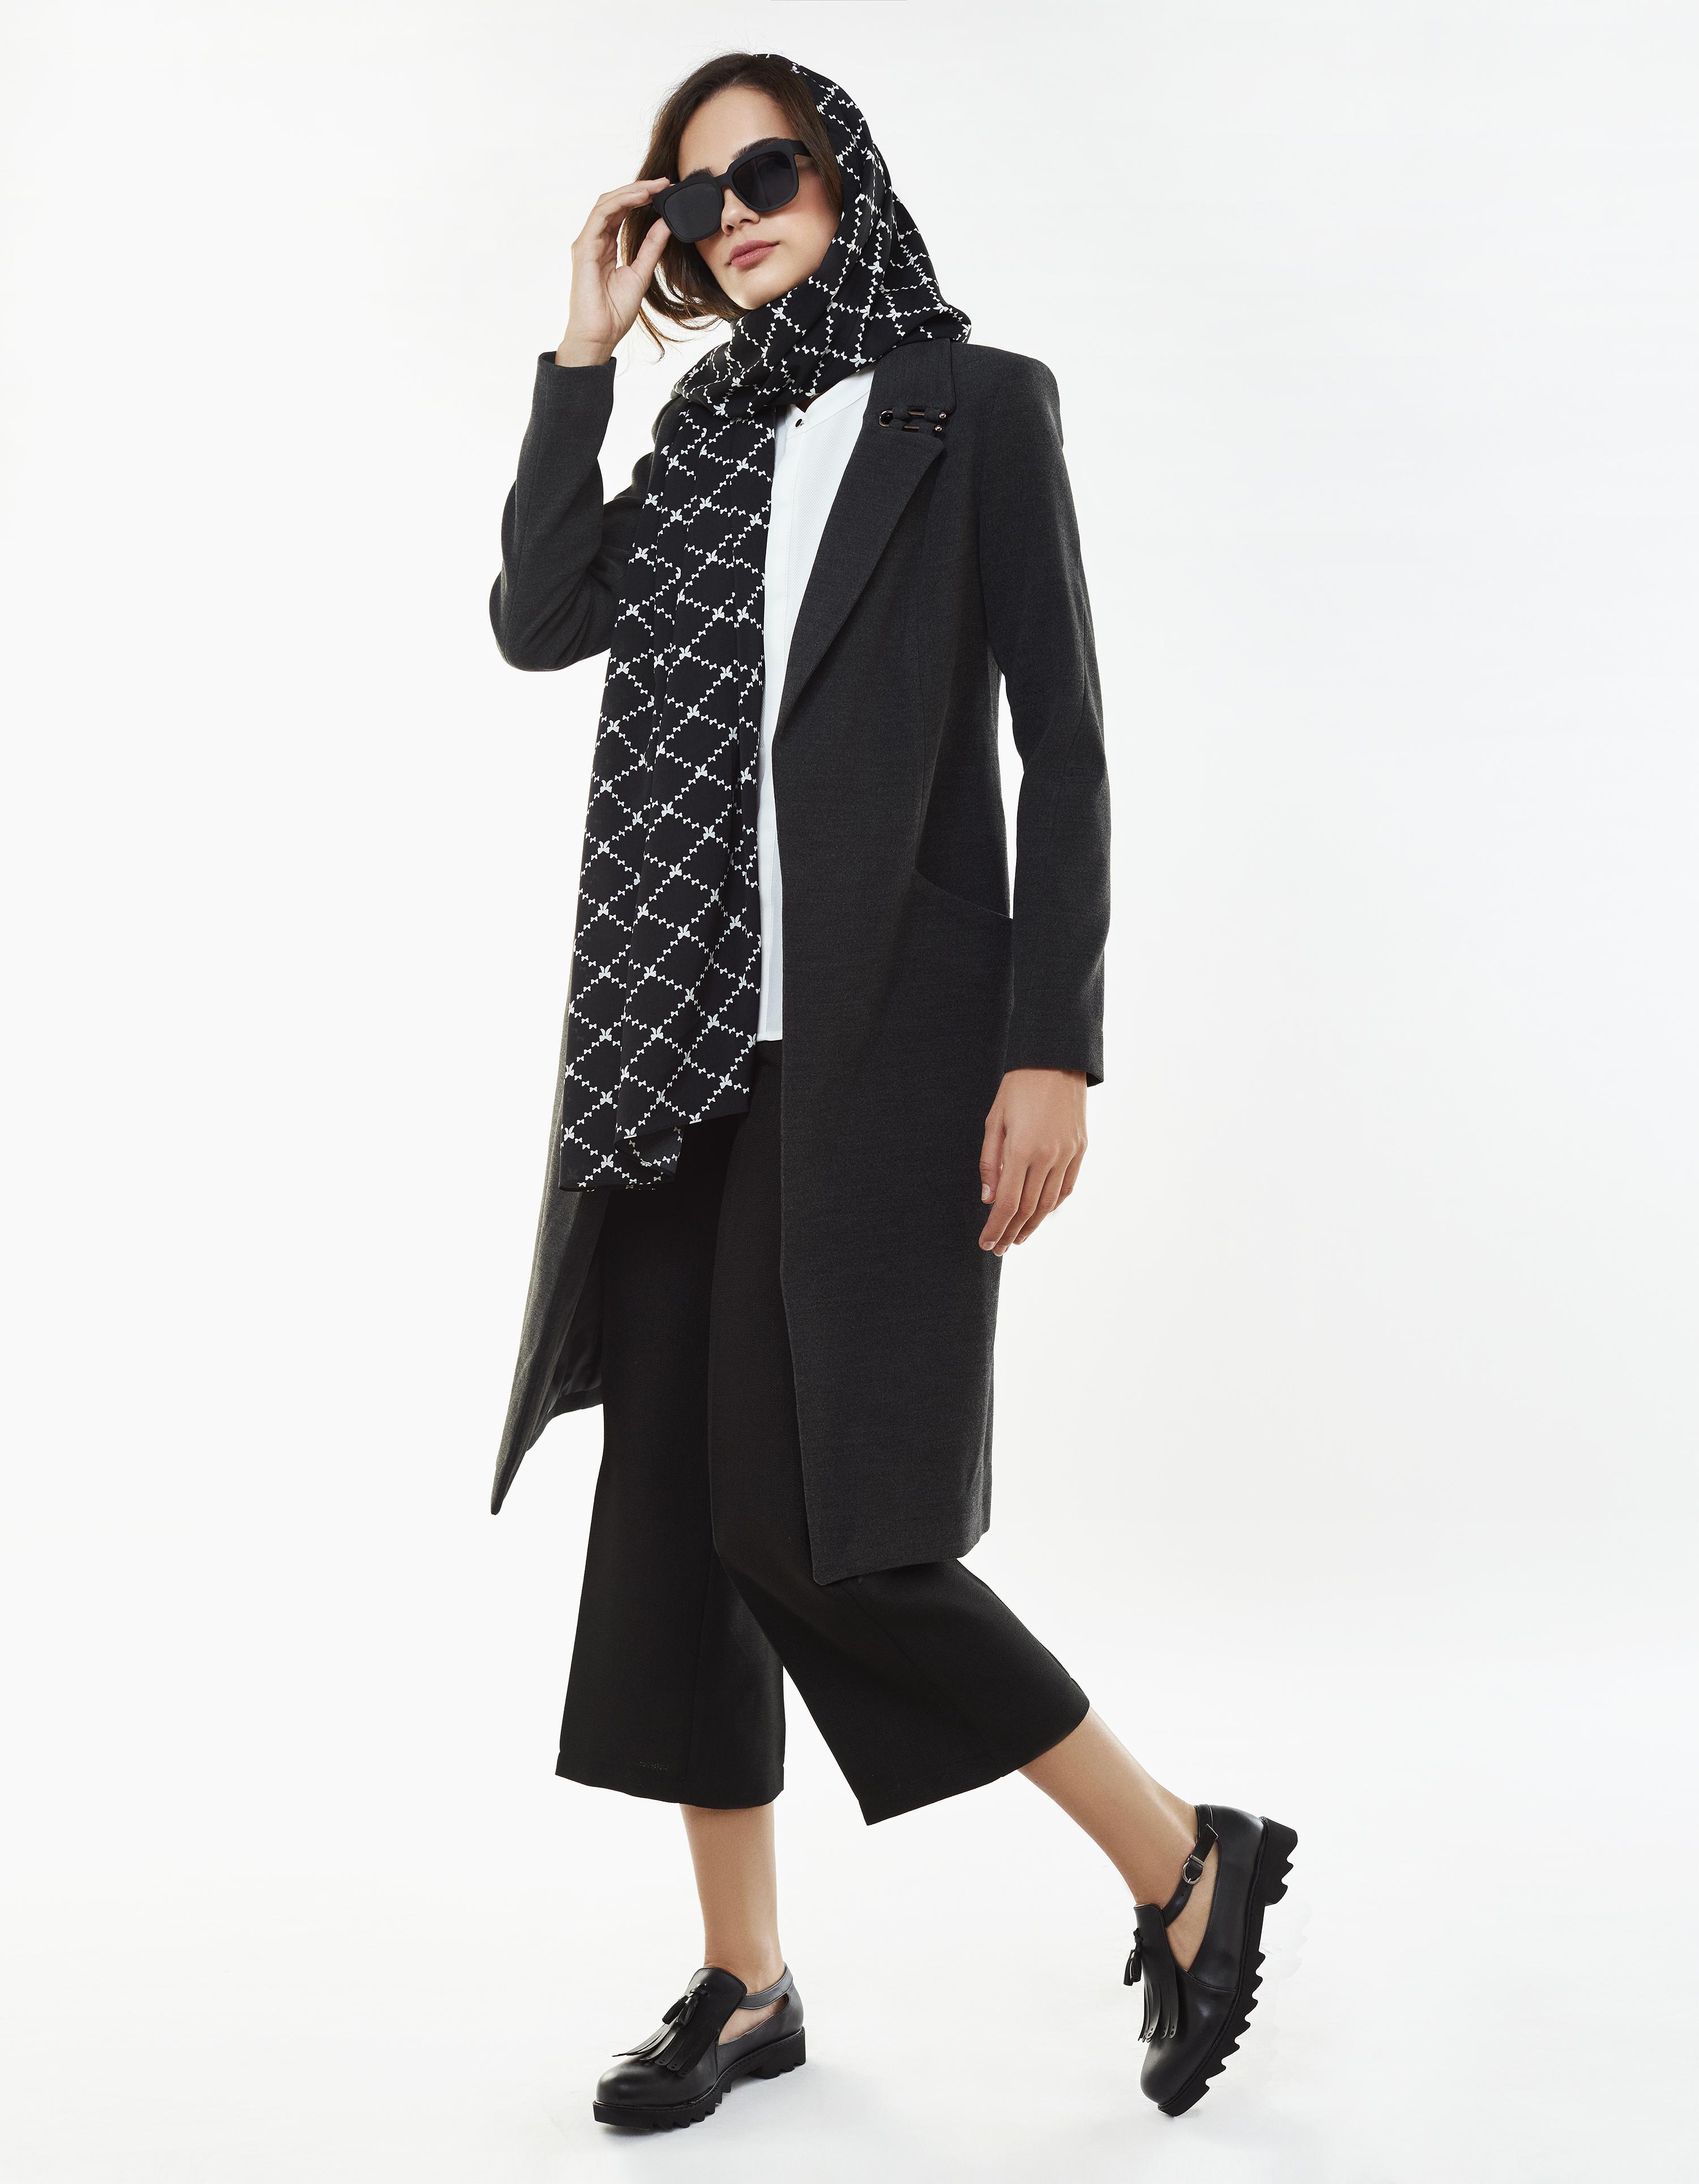 iran-stili-tesettur-giyim